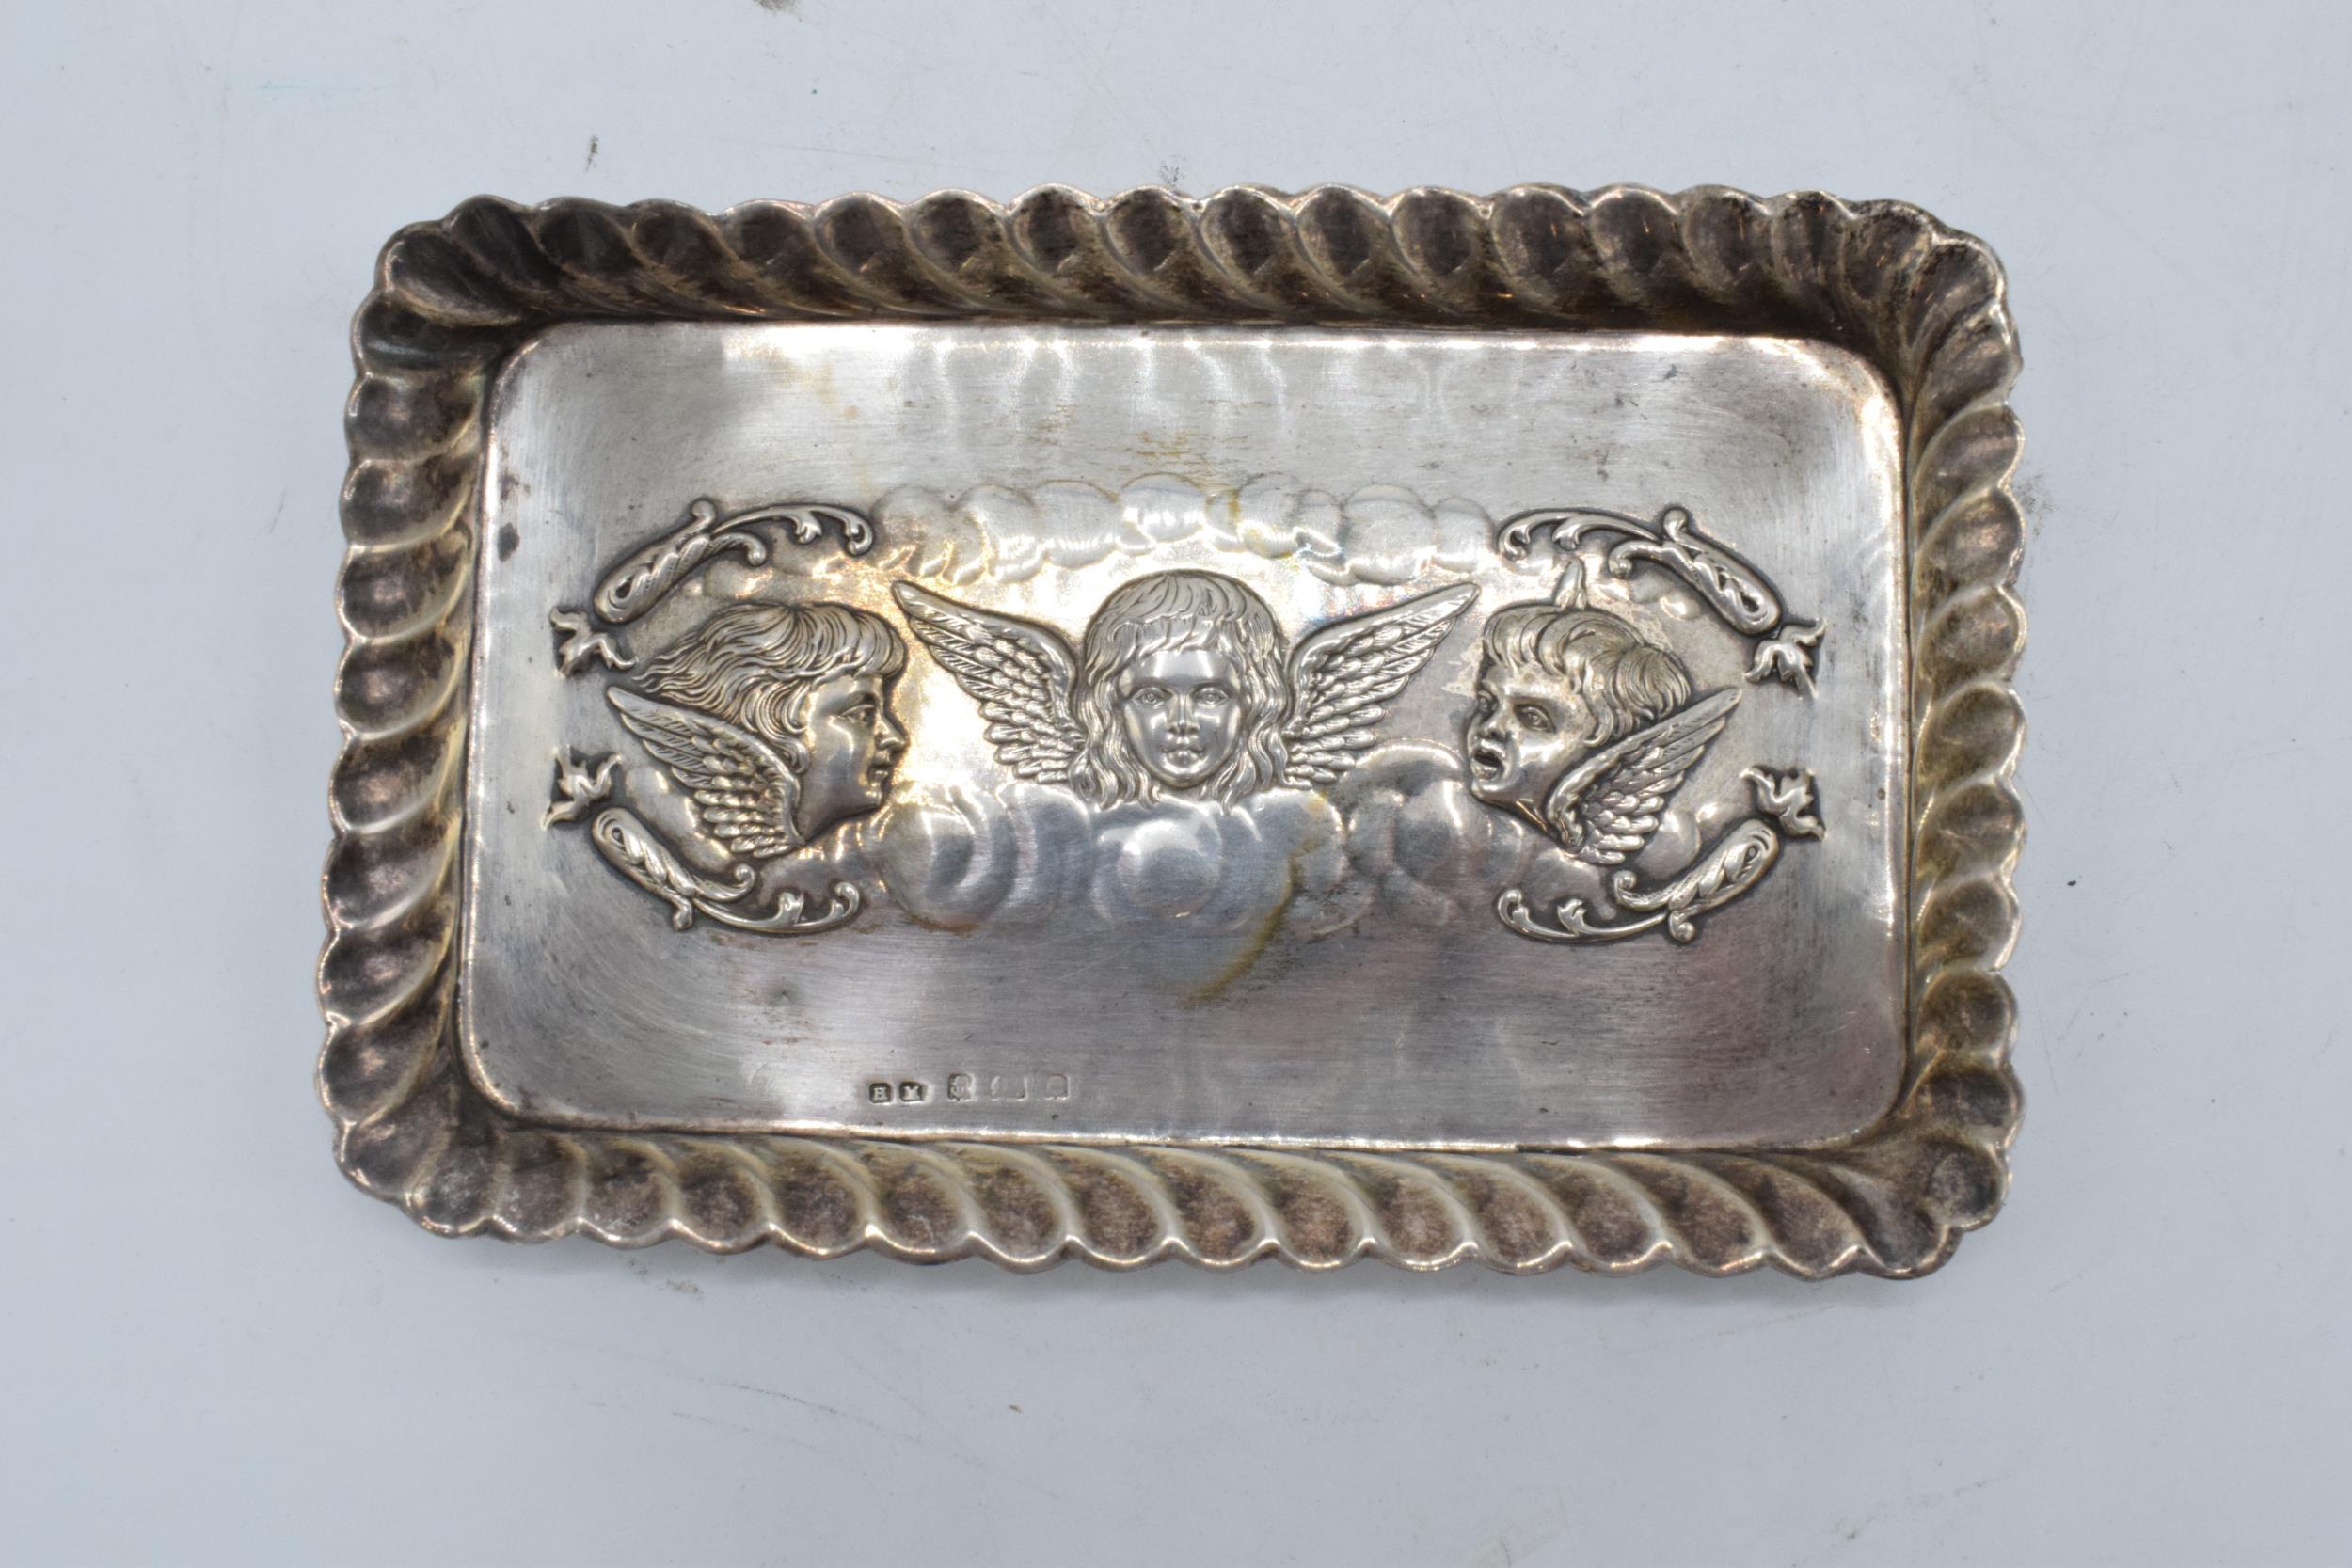 Silver Reynold's Angels rectangular tray. 57.1 grams. Birmingham 1904. Hallmarks slightly rubbed. - Image 2 of 4